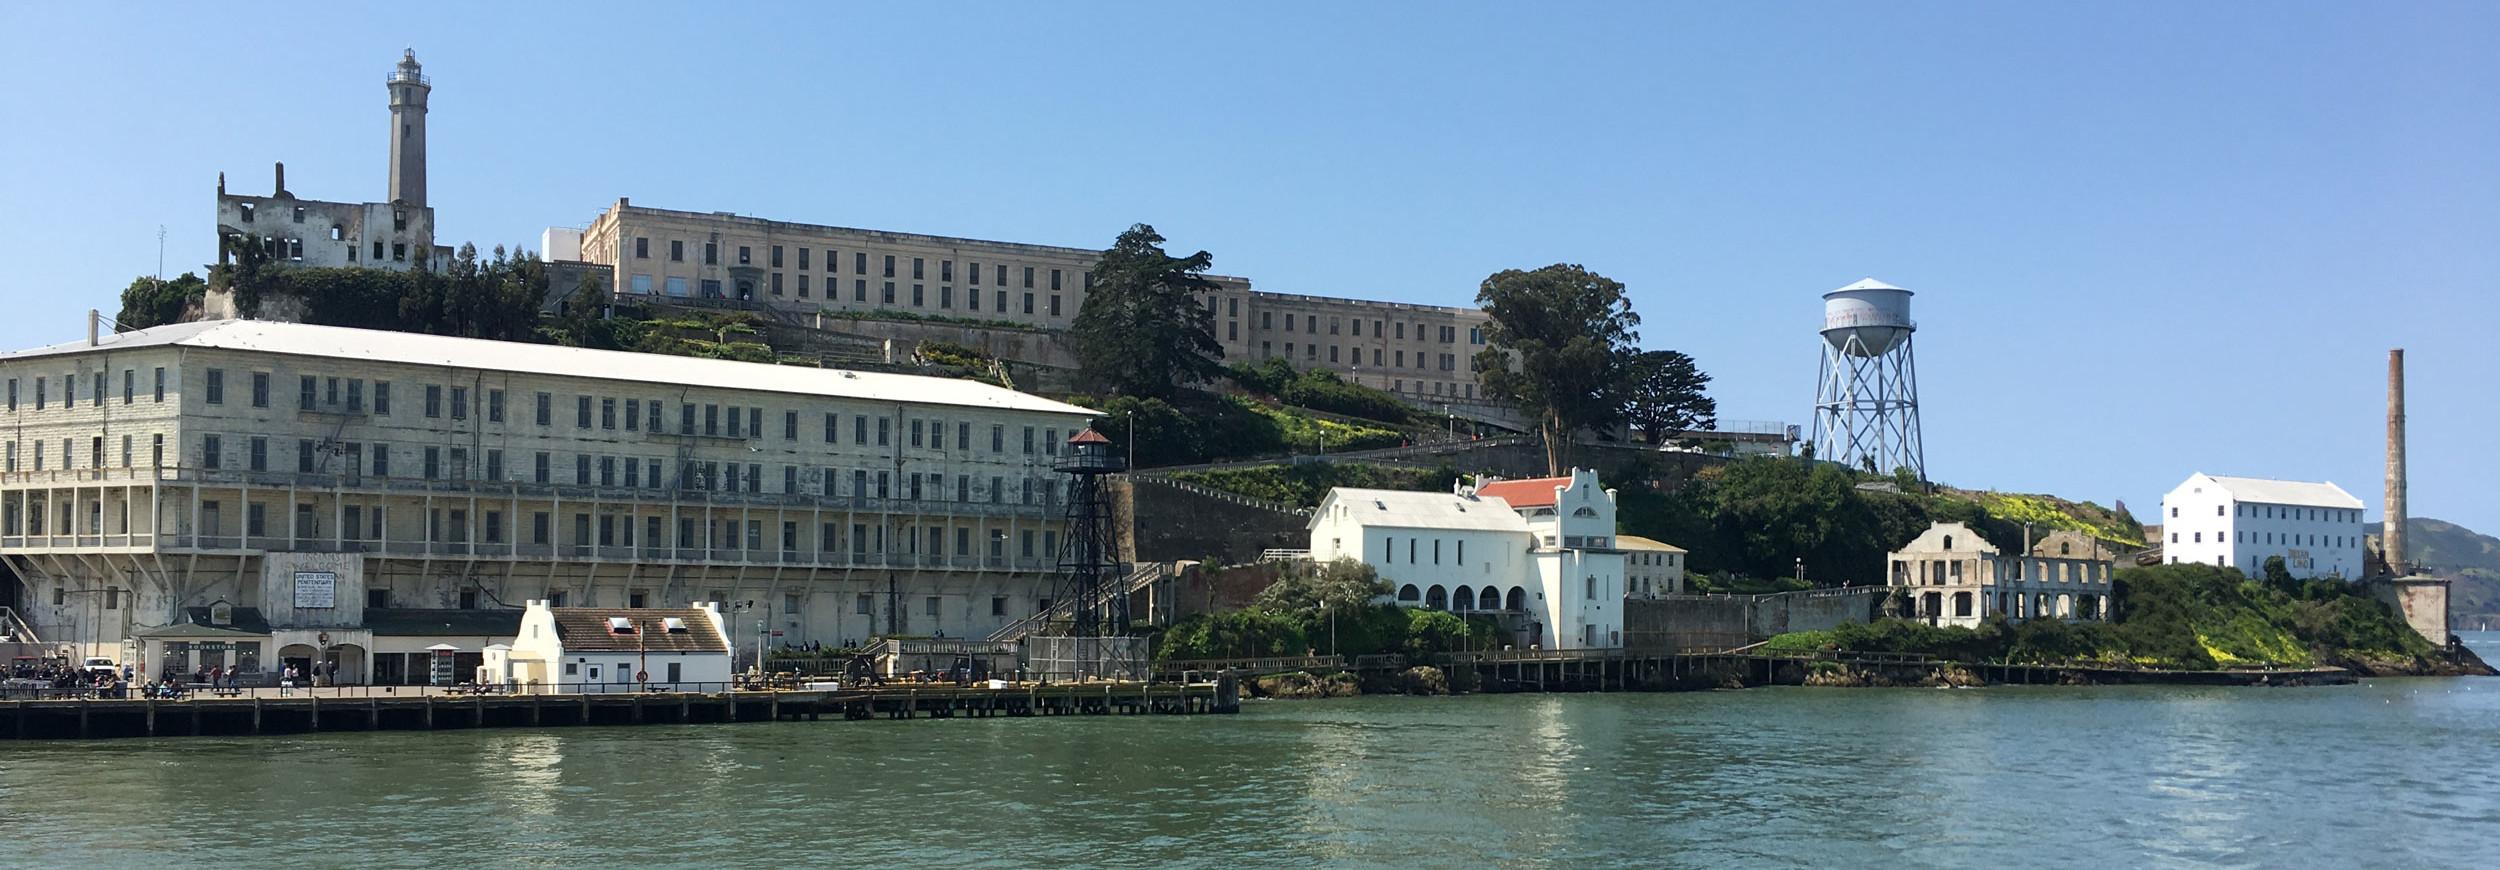 Reisebericht Kalifornien - Gefängnisinsel Alcatraz